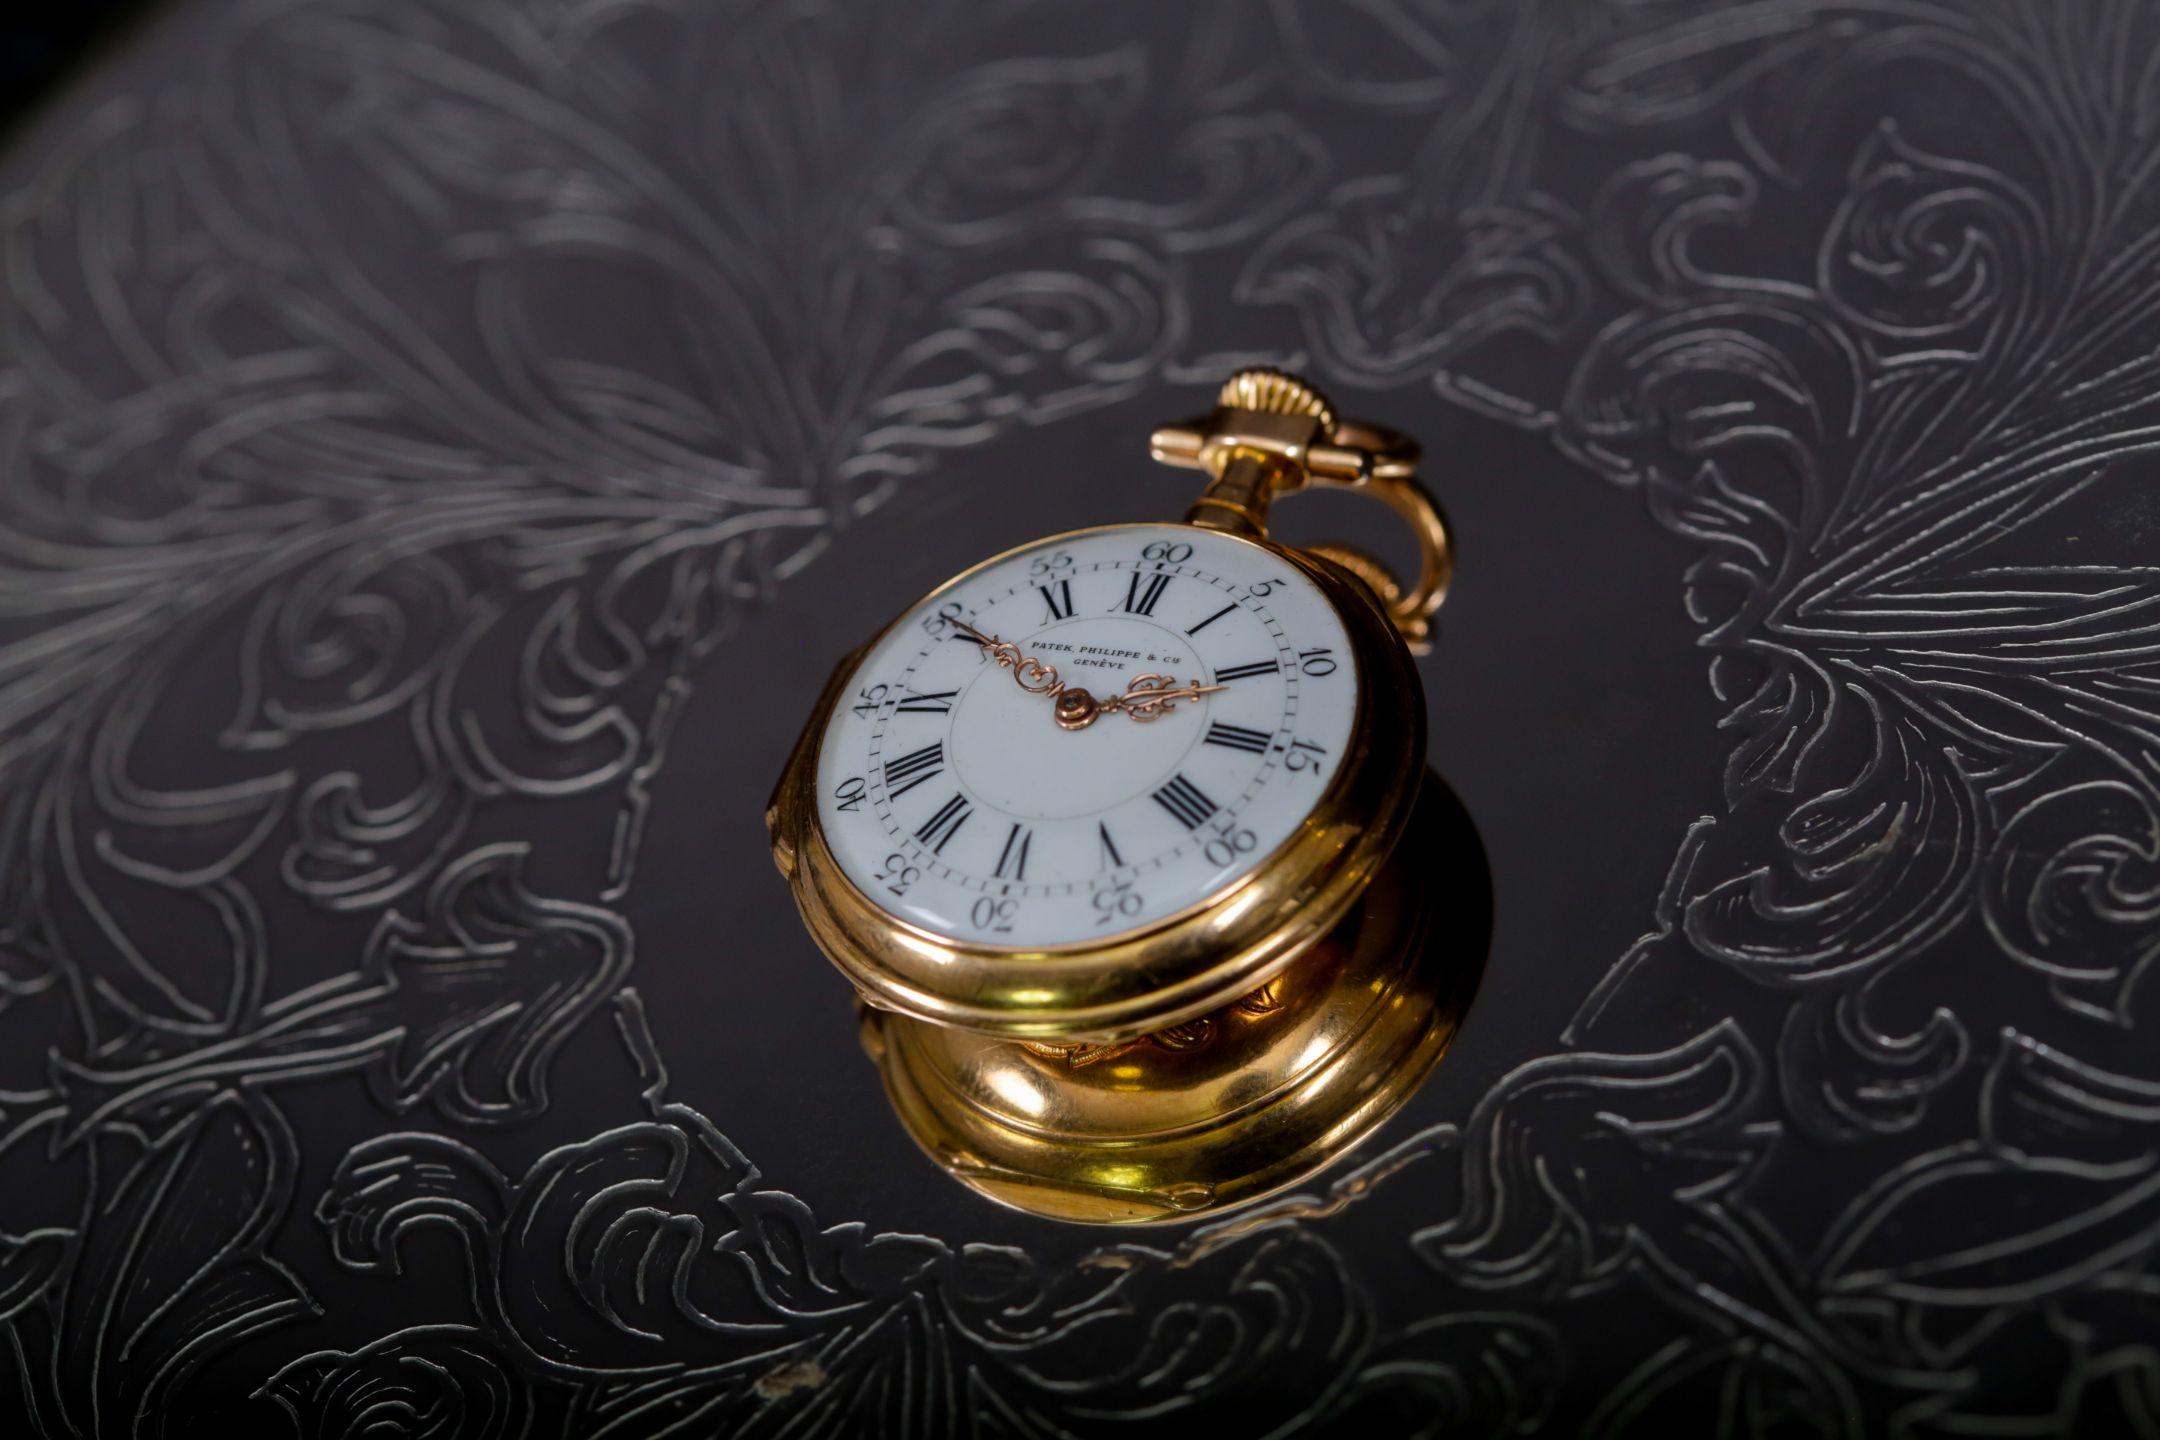 Patek Philippe Louis XV Pocket watch